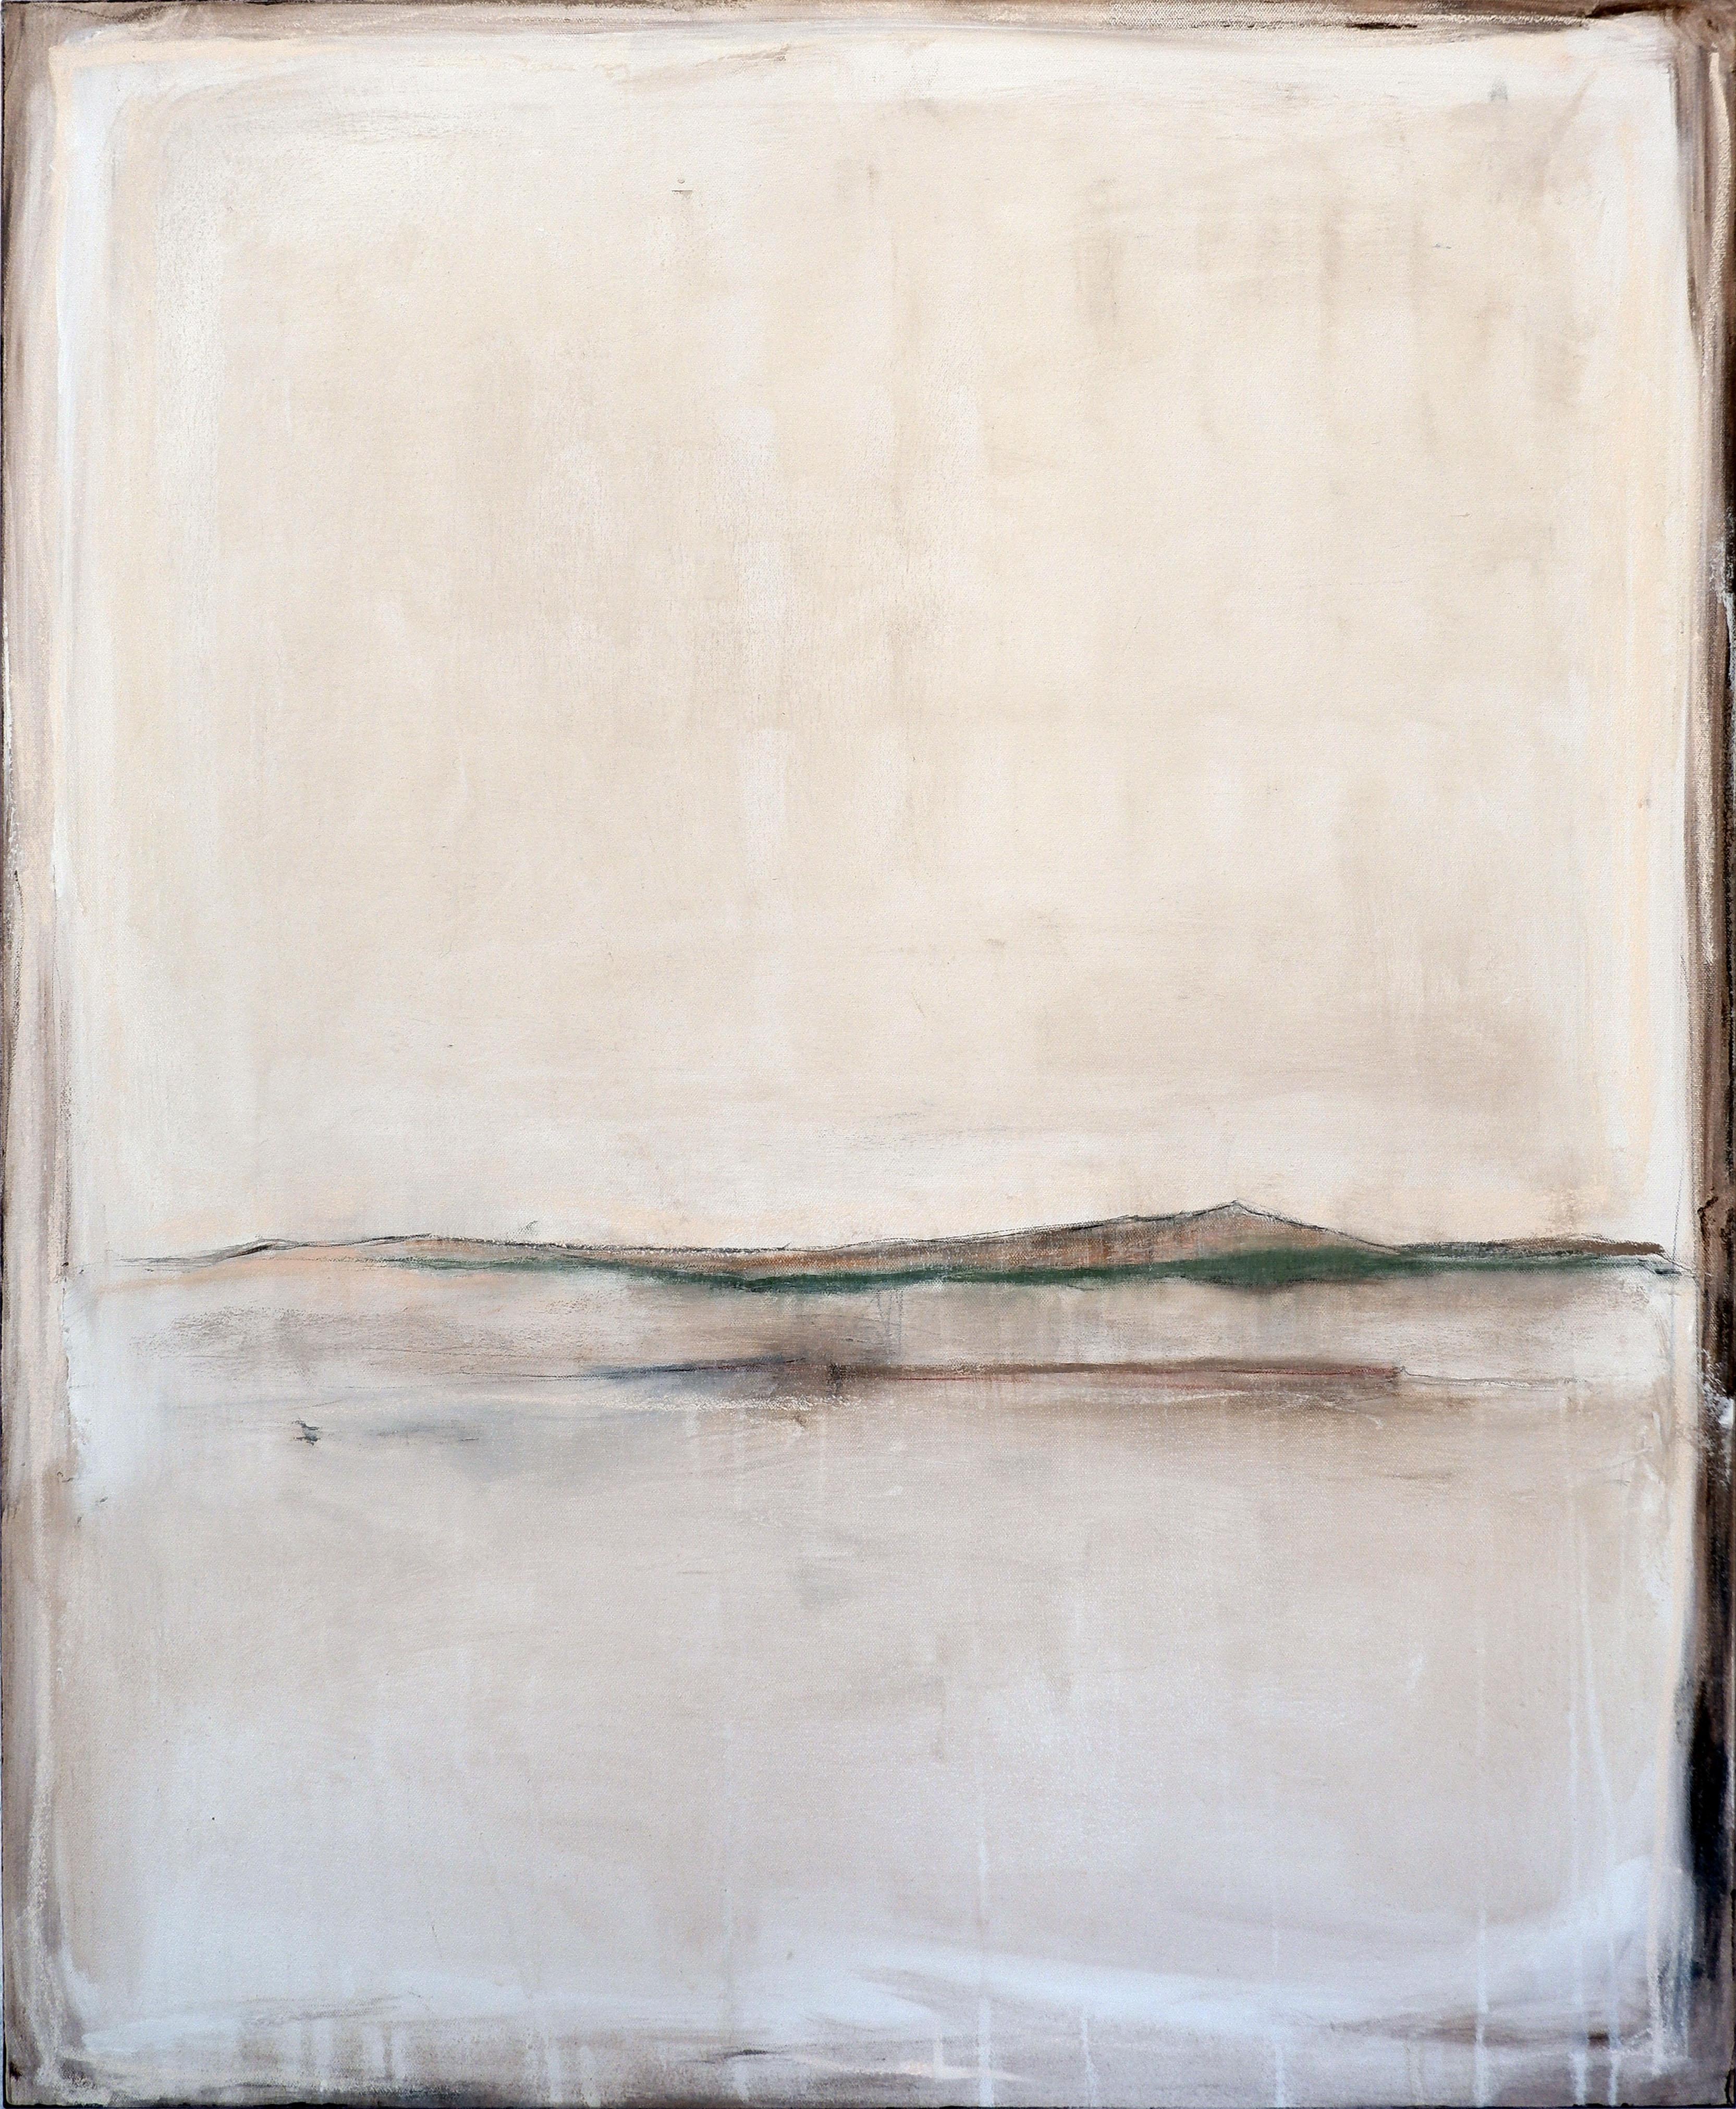 Landscape 101, Contemporary Mixed media Abstract Minimalist White Monochrome